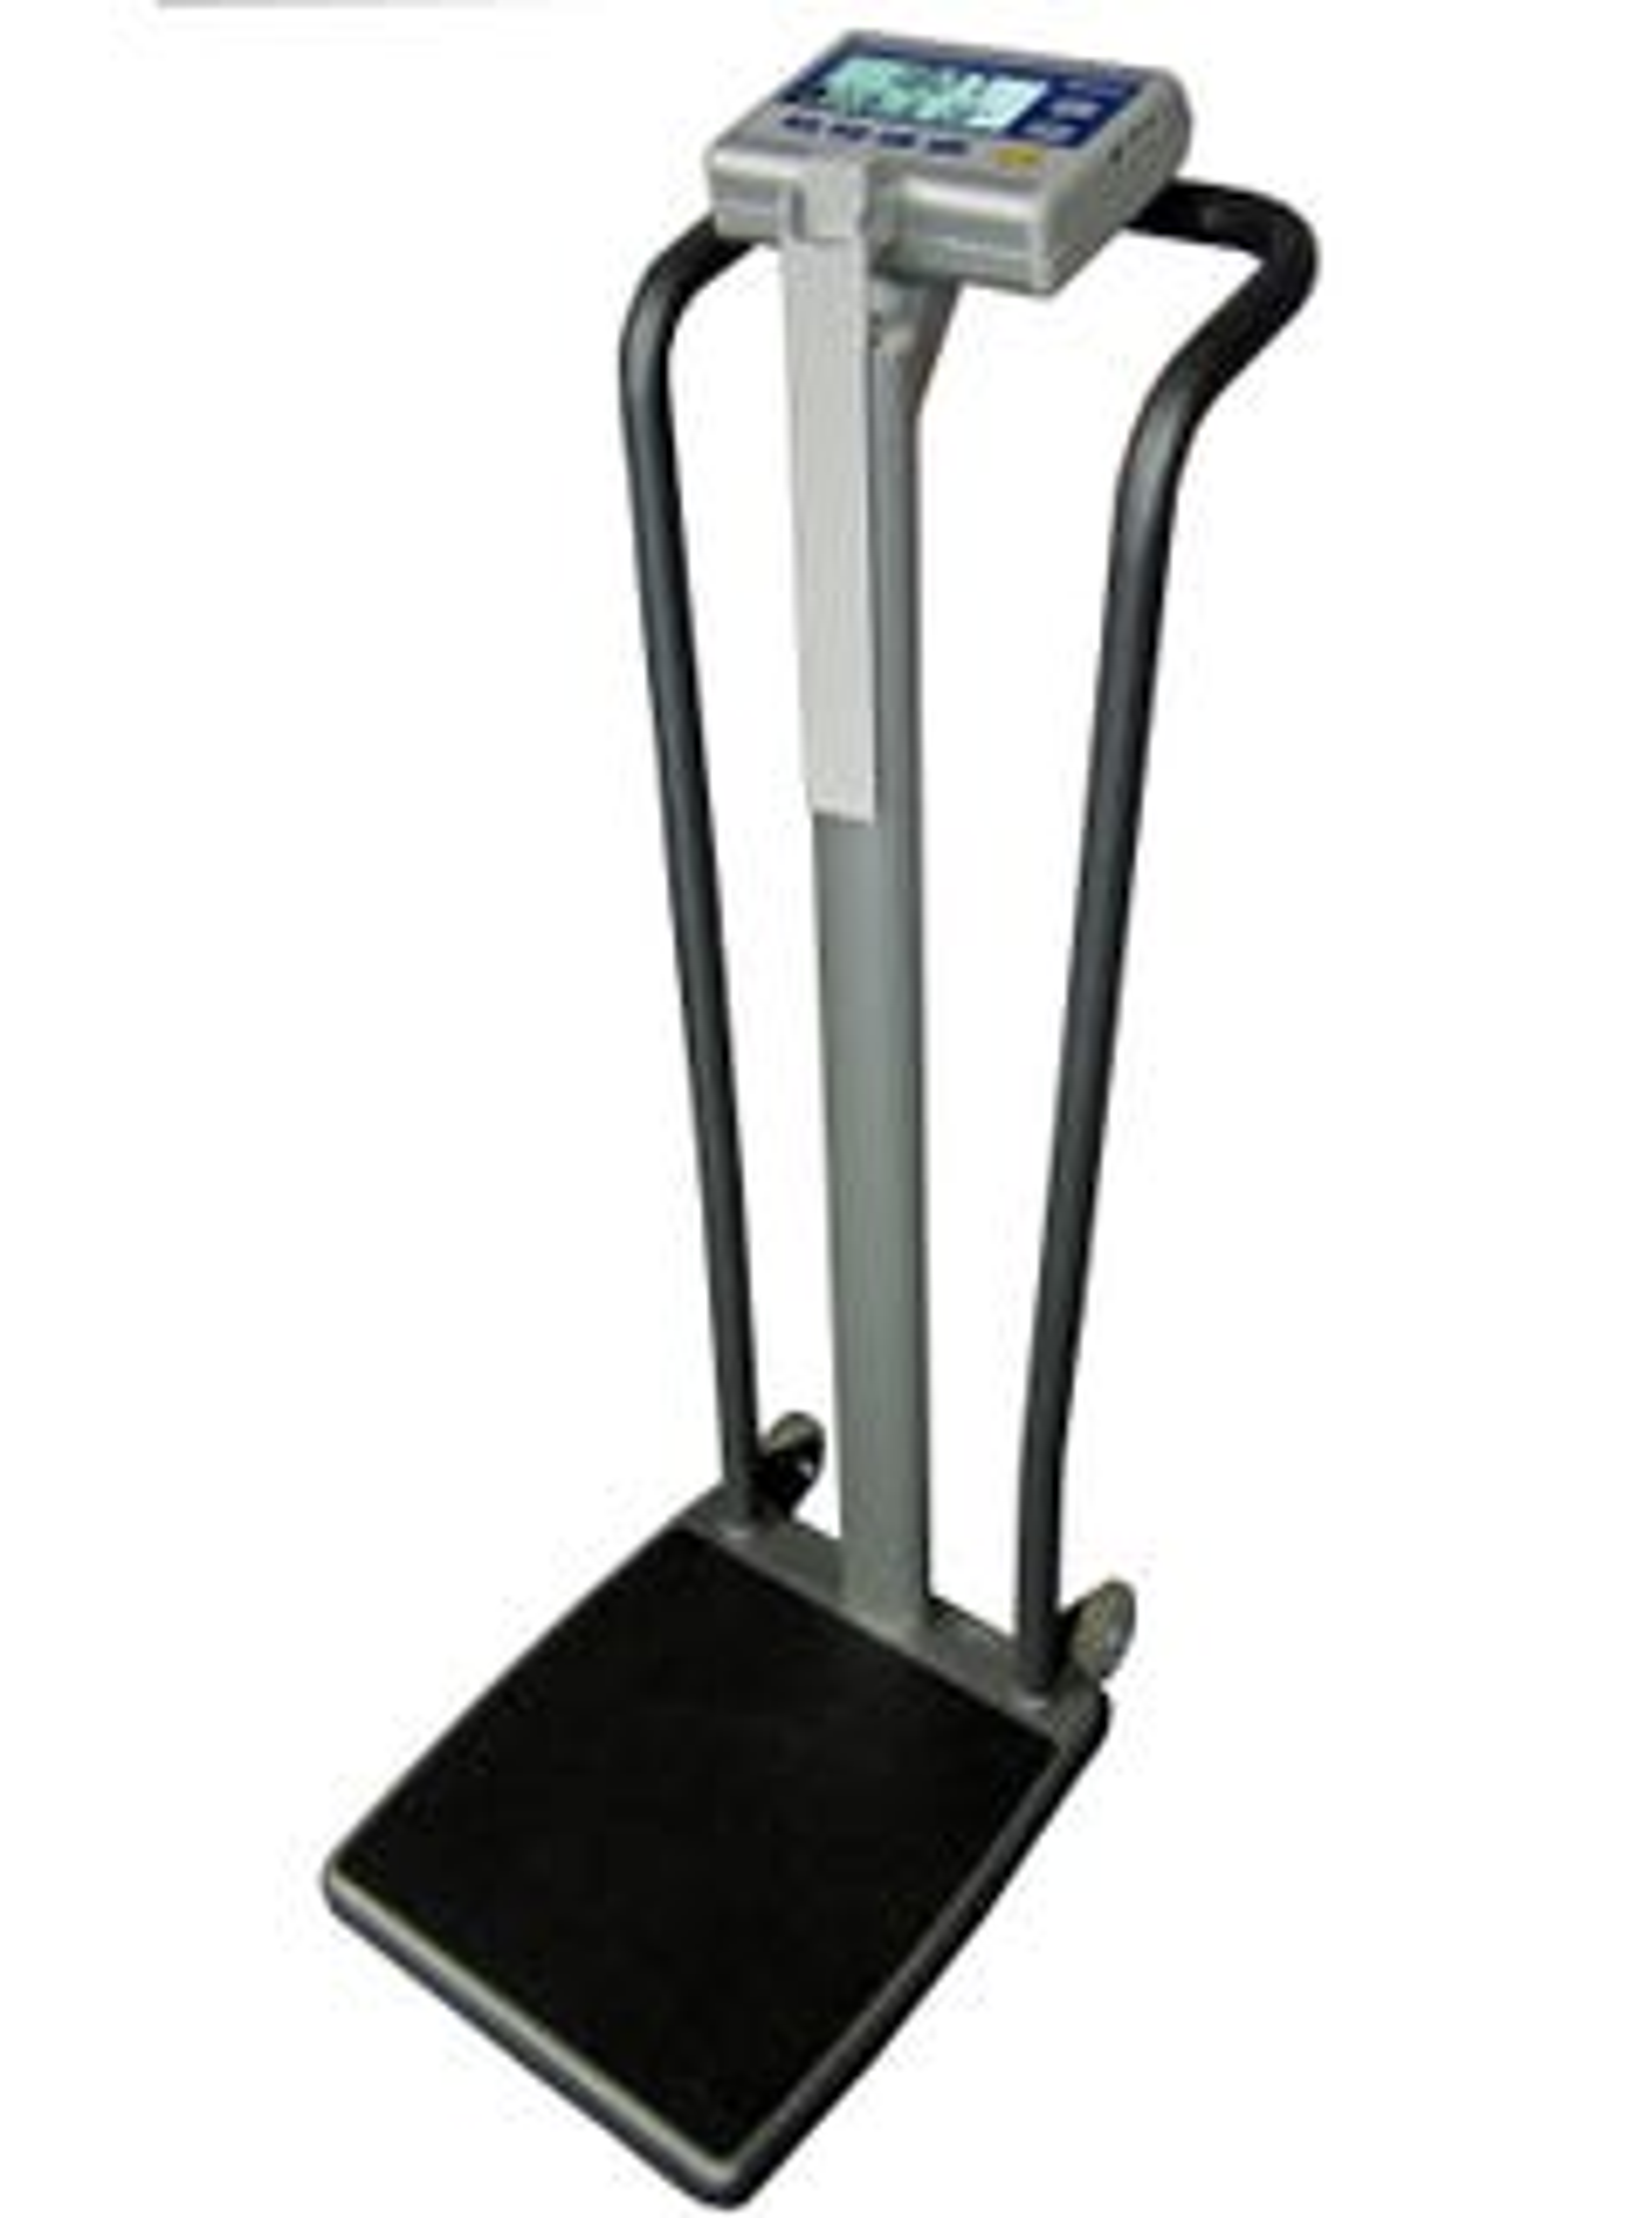 "Befour MX807 Tilt & Roll Compact Handrail Scale with BMI, 16"" x 18"" Platform & 750 lb capacity"